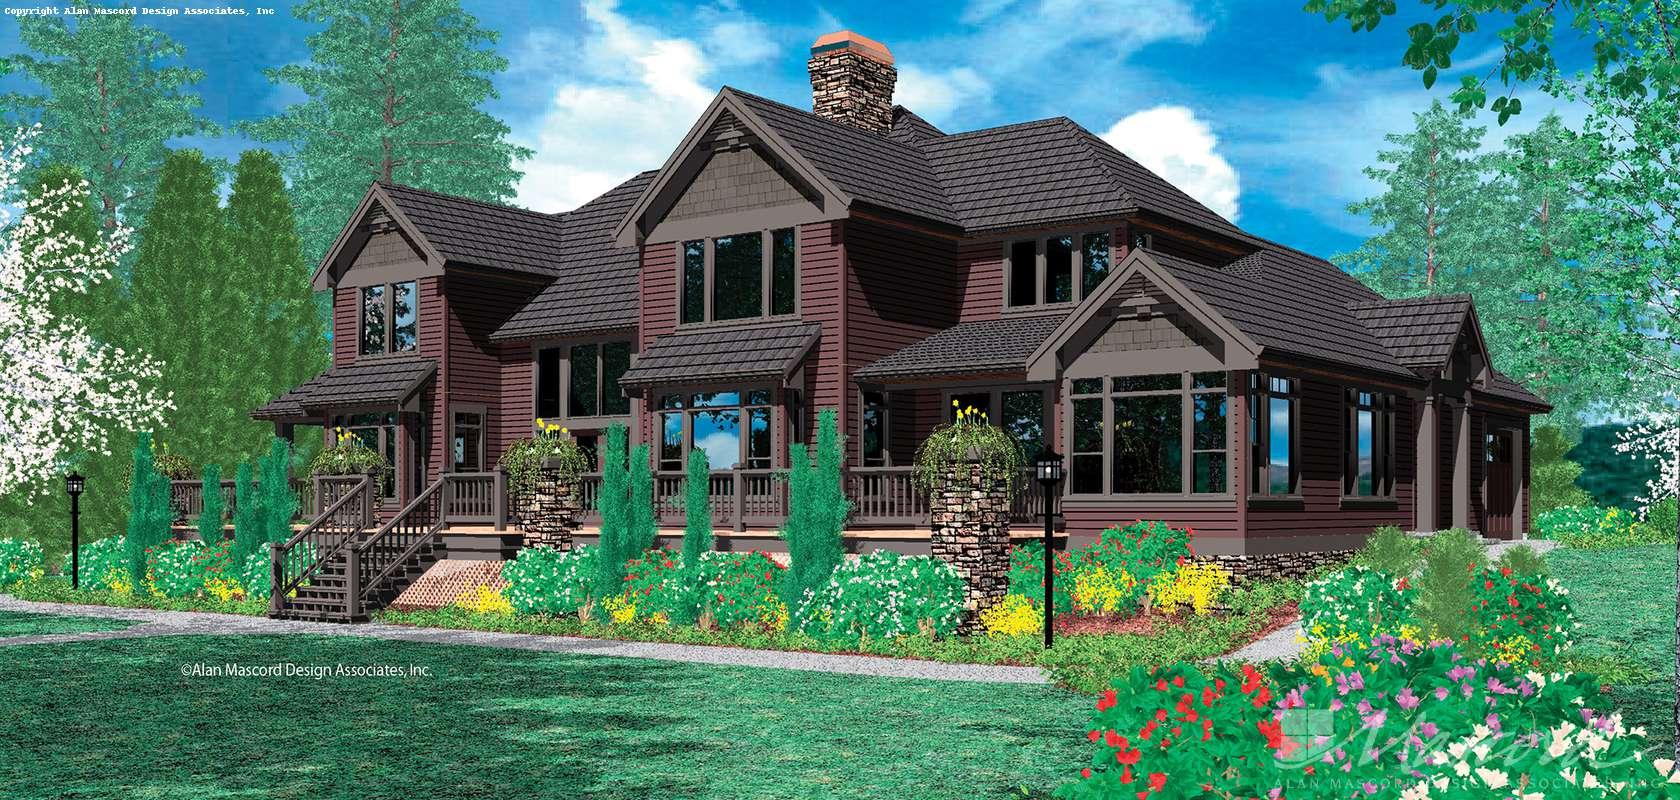 Mascord House Plan 2421: The Ingram